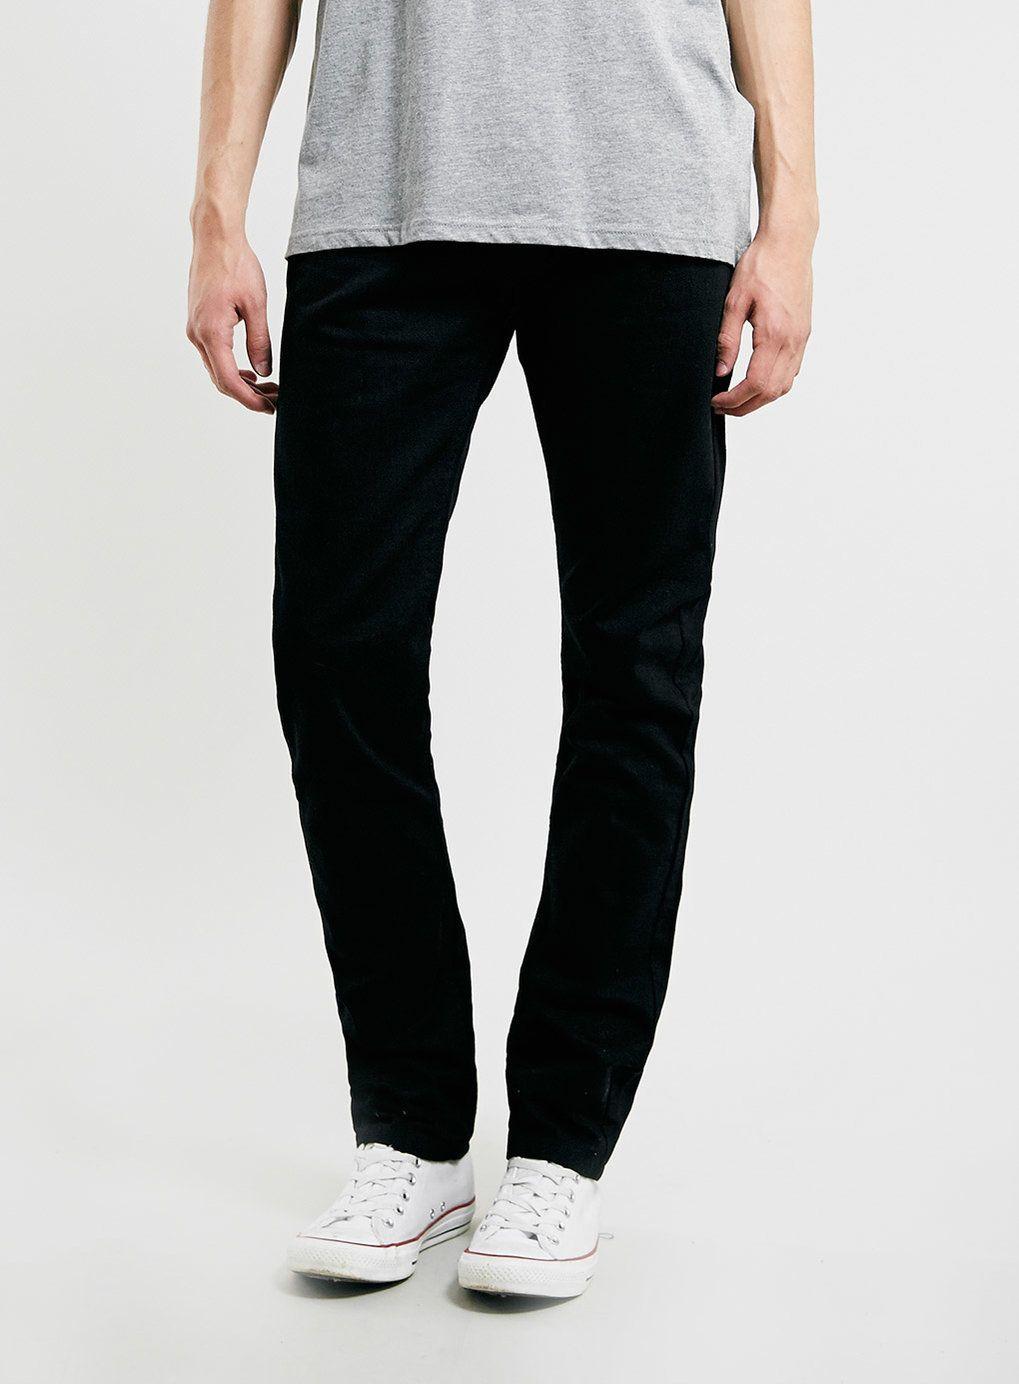 Black vintage slim fit jeans mens slim tapered jeans